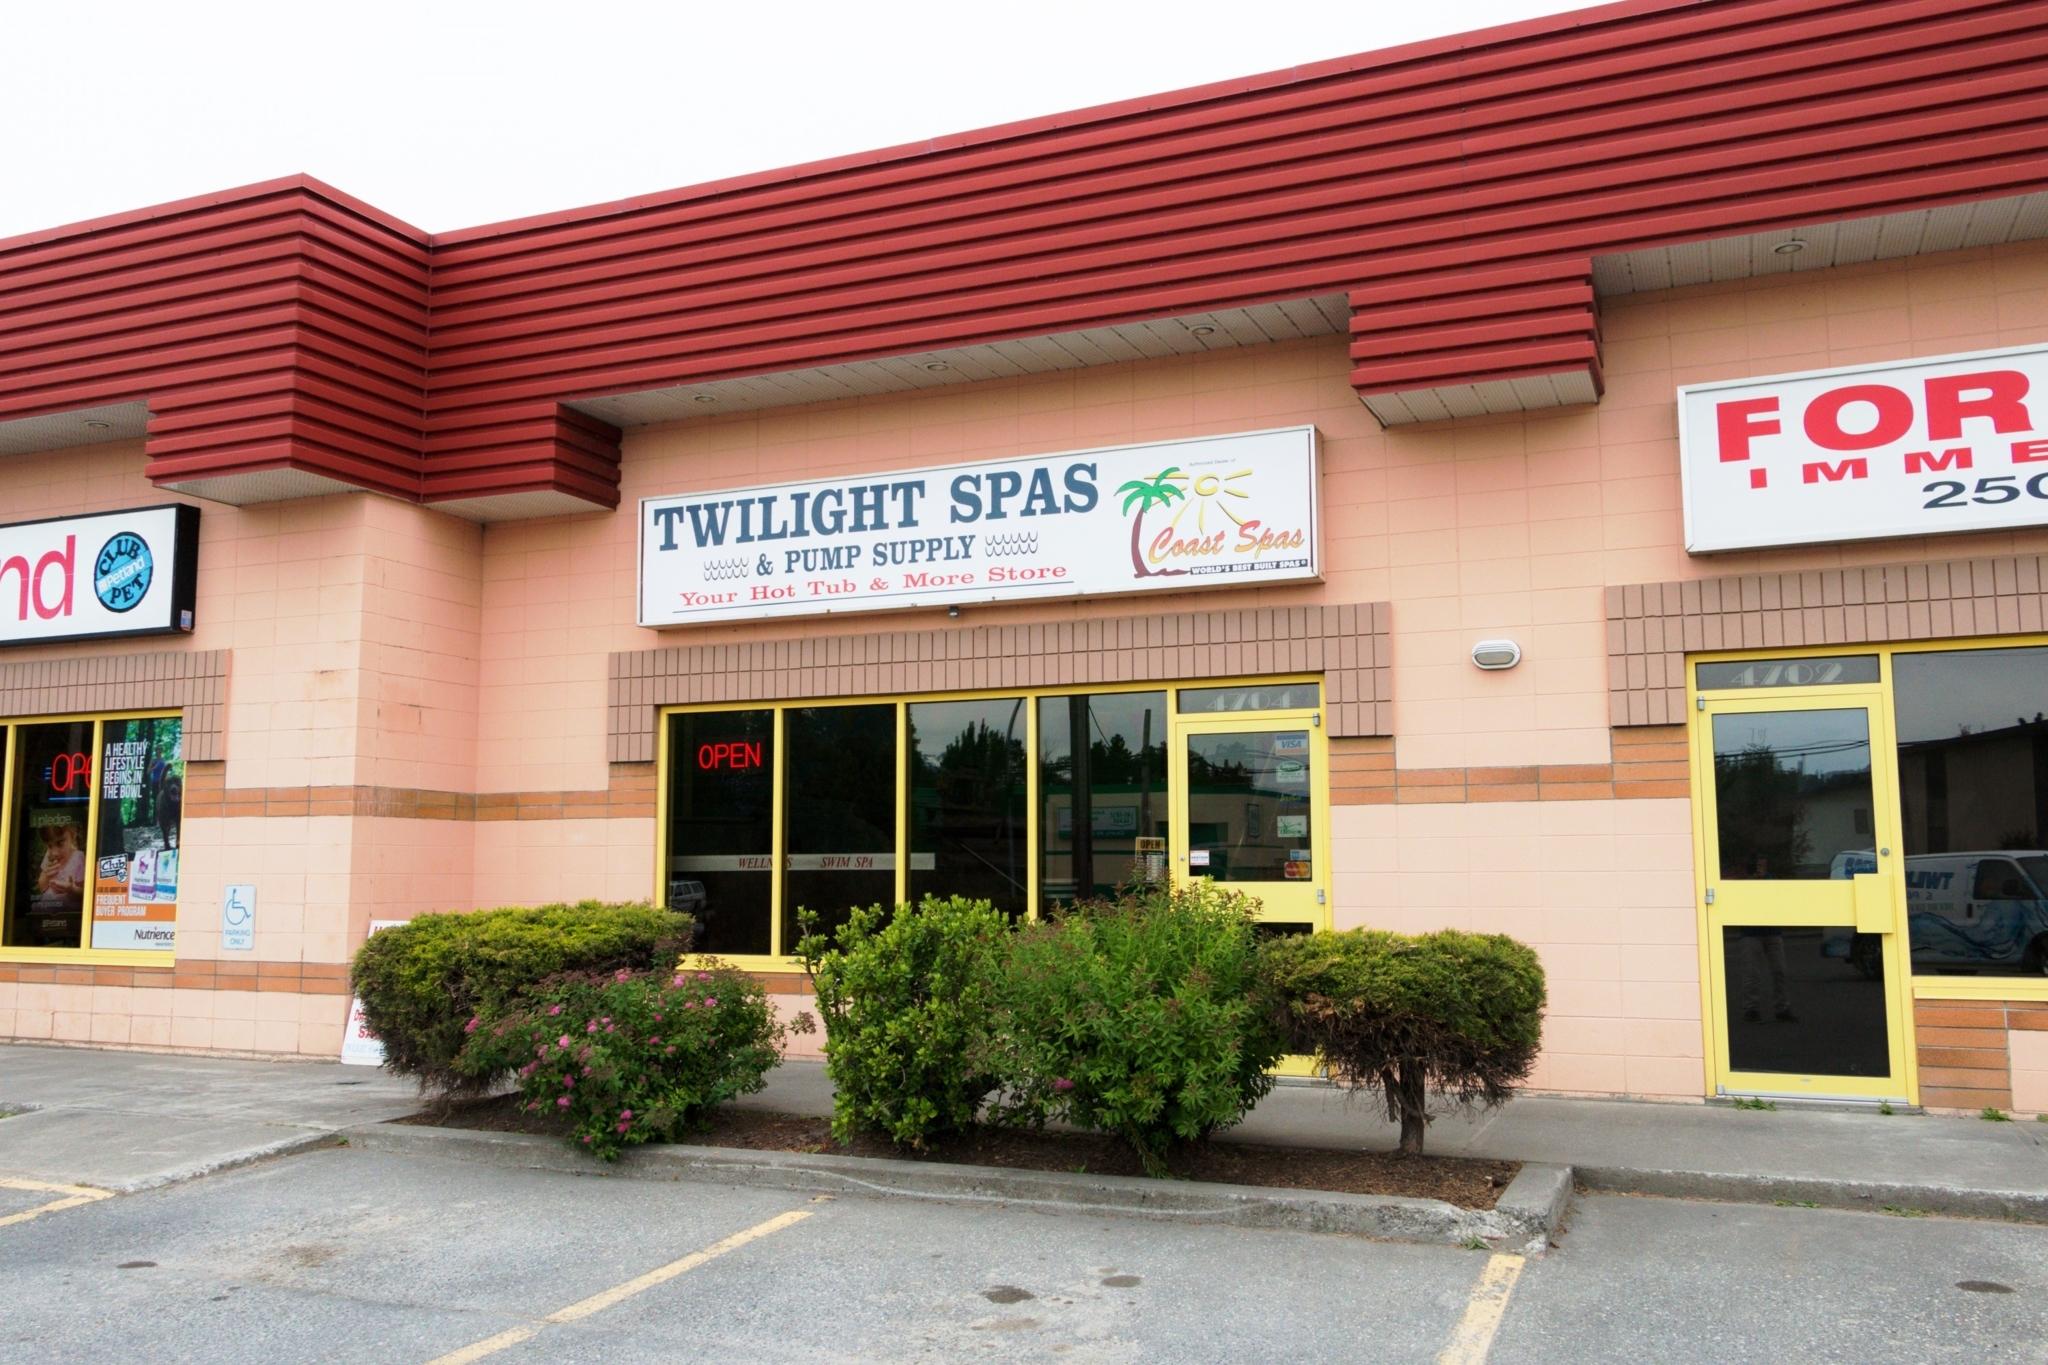 Twilight Spas & Pump Supply in Terrace